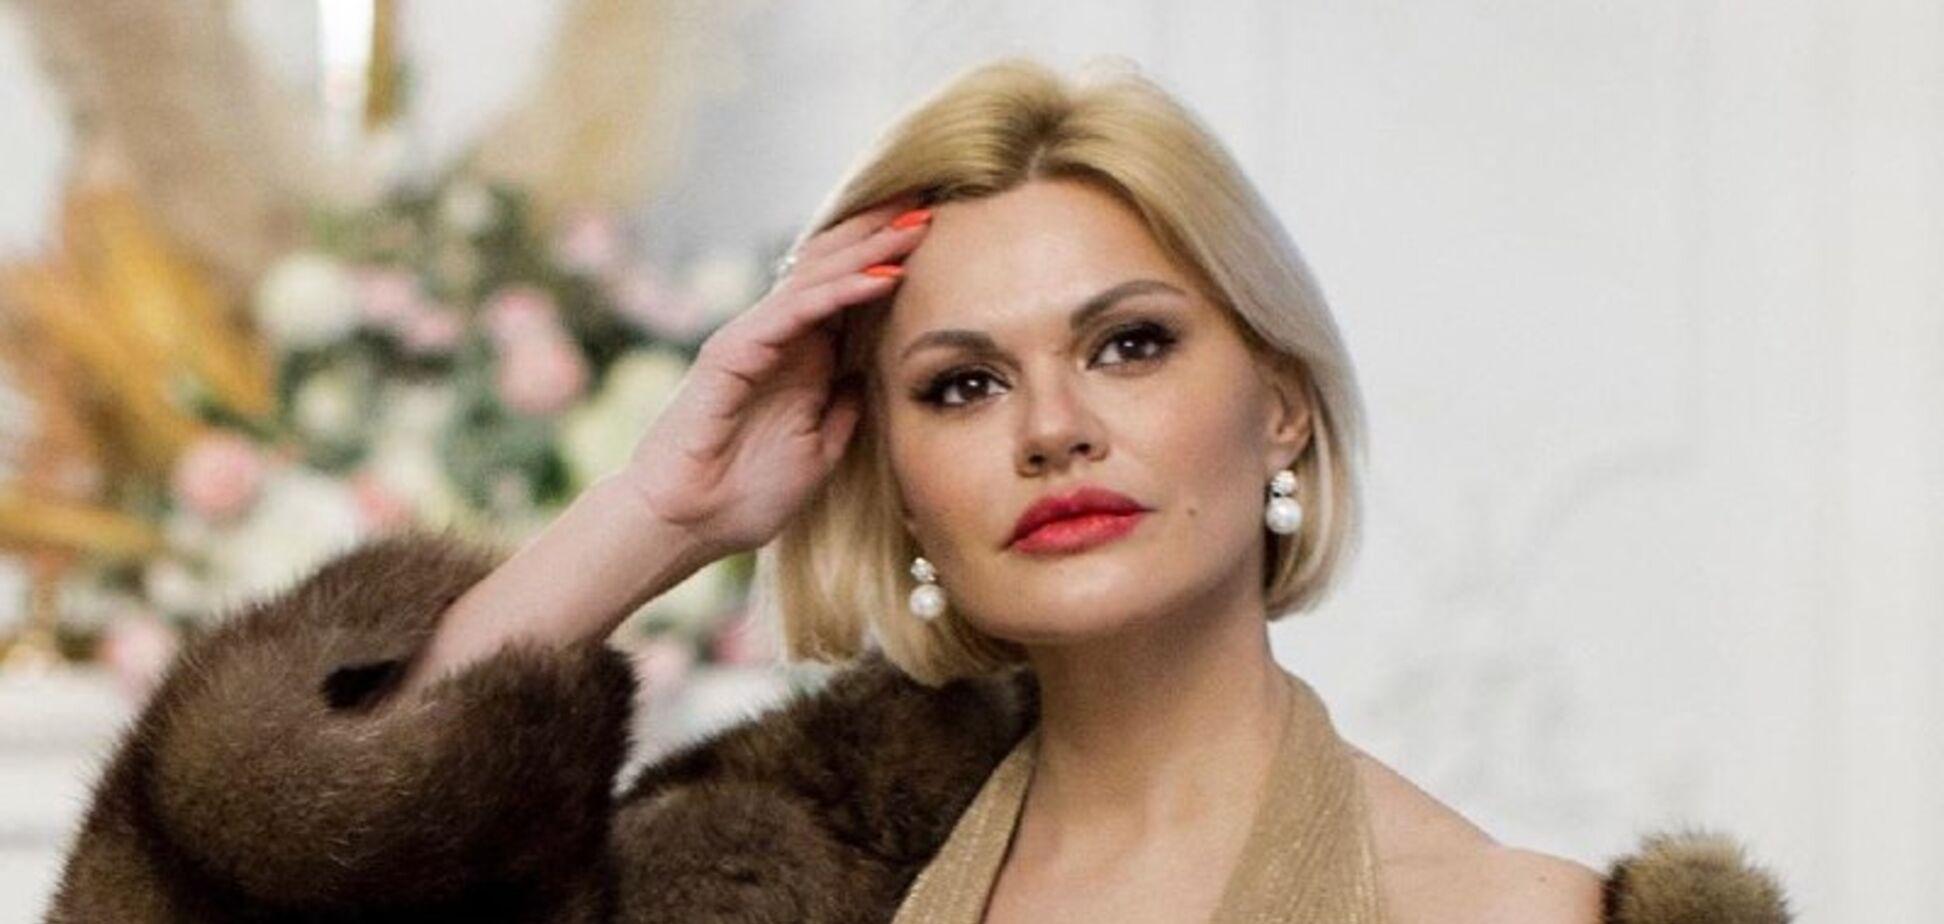 Ирине Круг – 44: как спустя годы живет жена ушедшей легенды 90-х